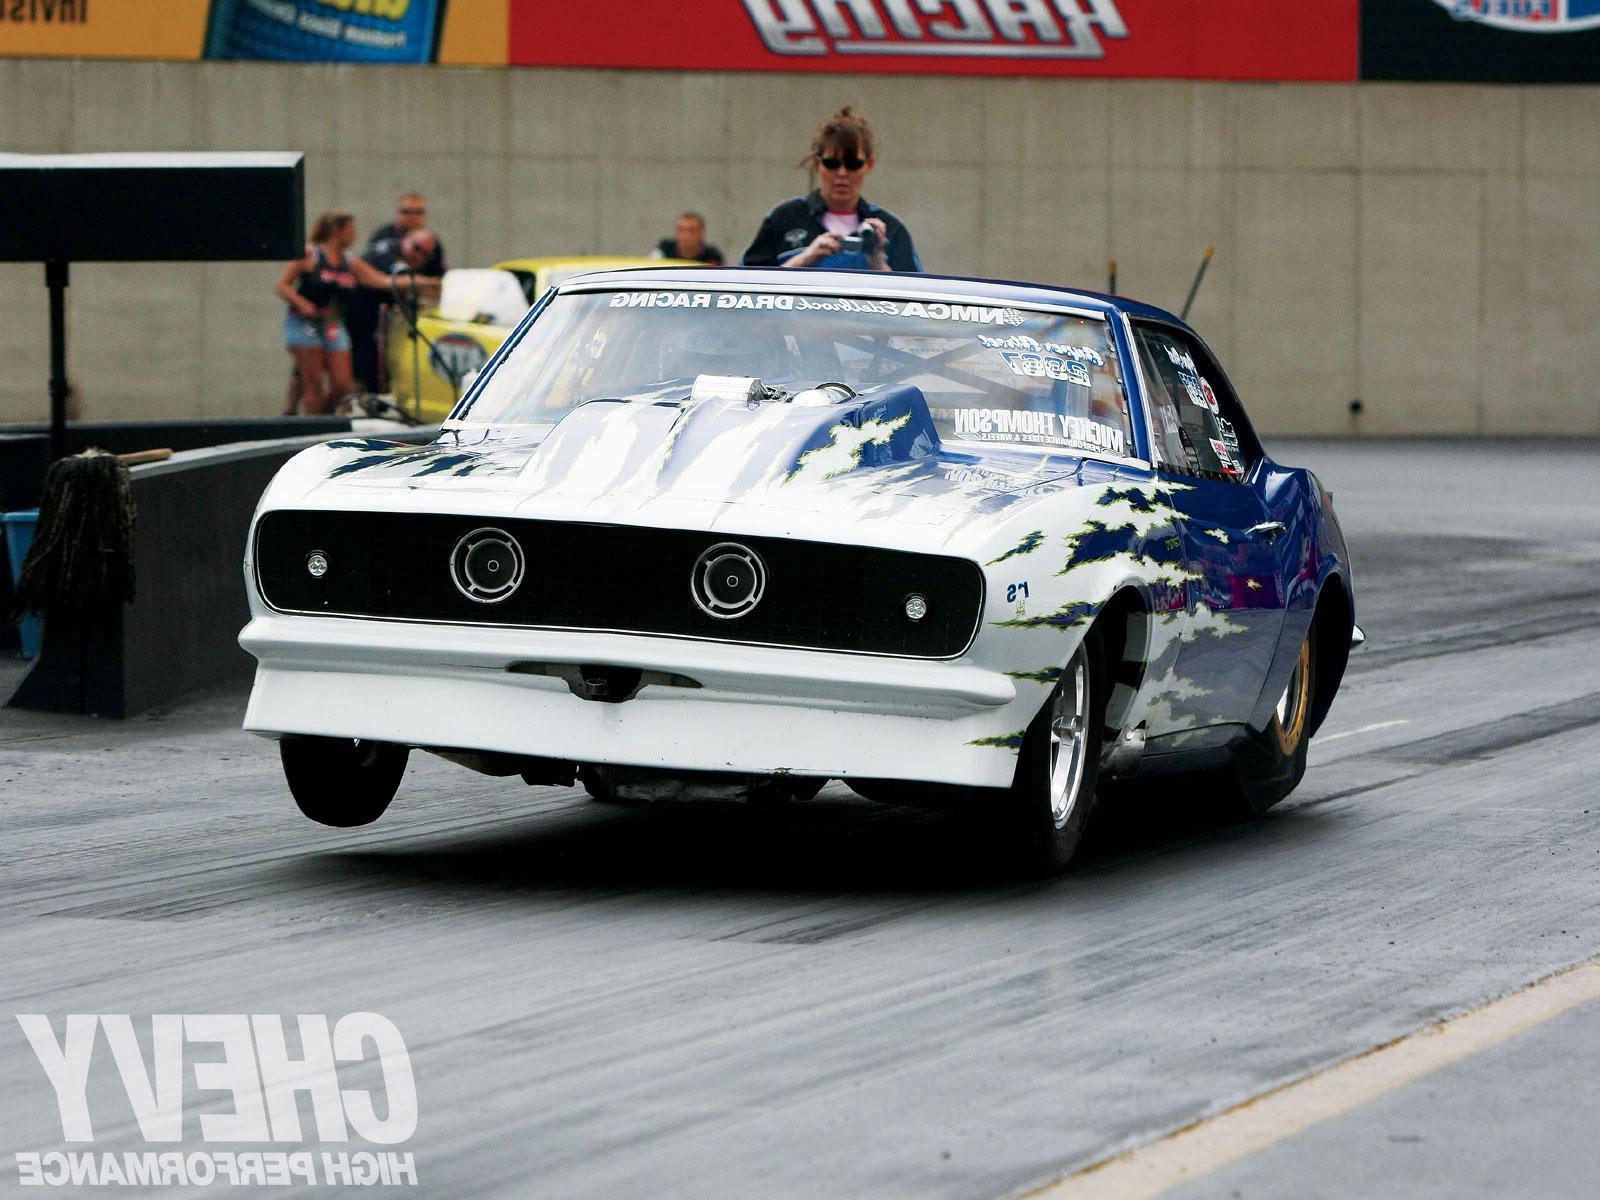 Nmca Edelbrock Drag Racing